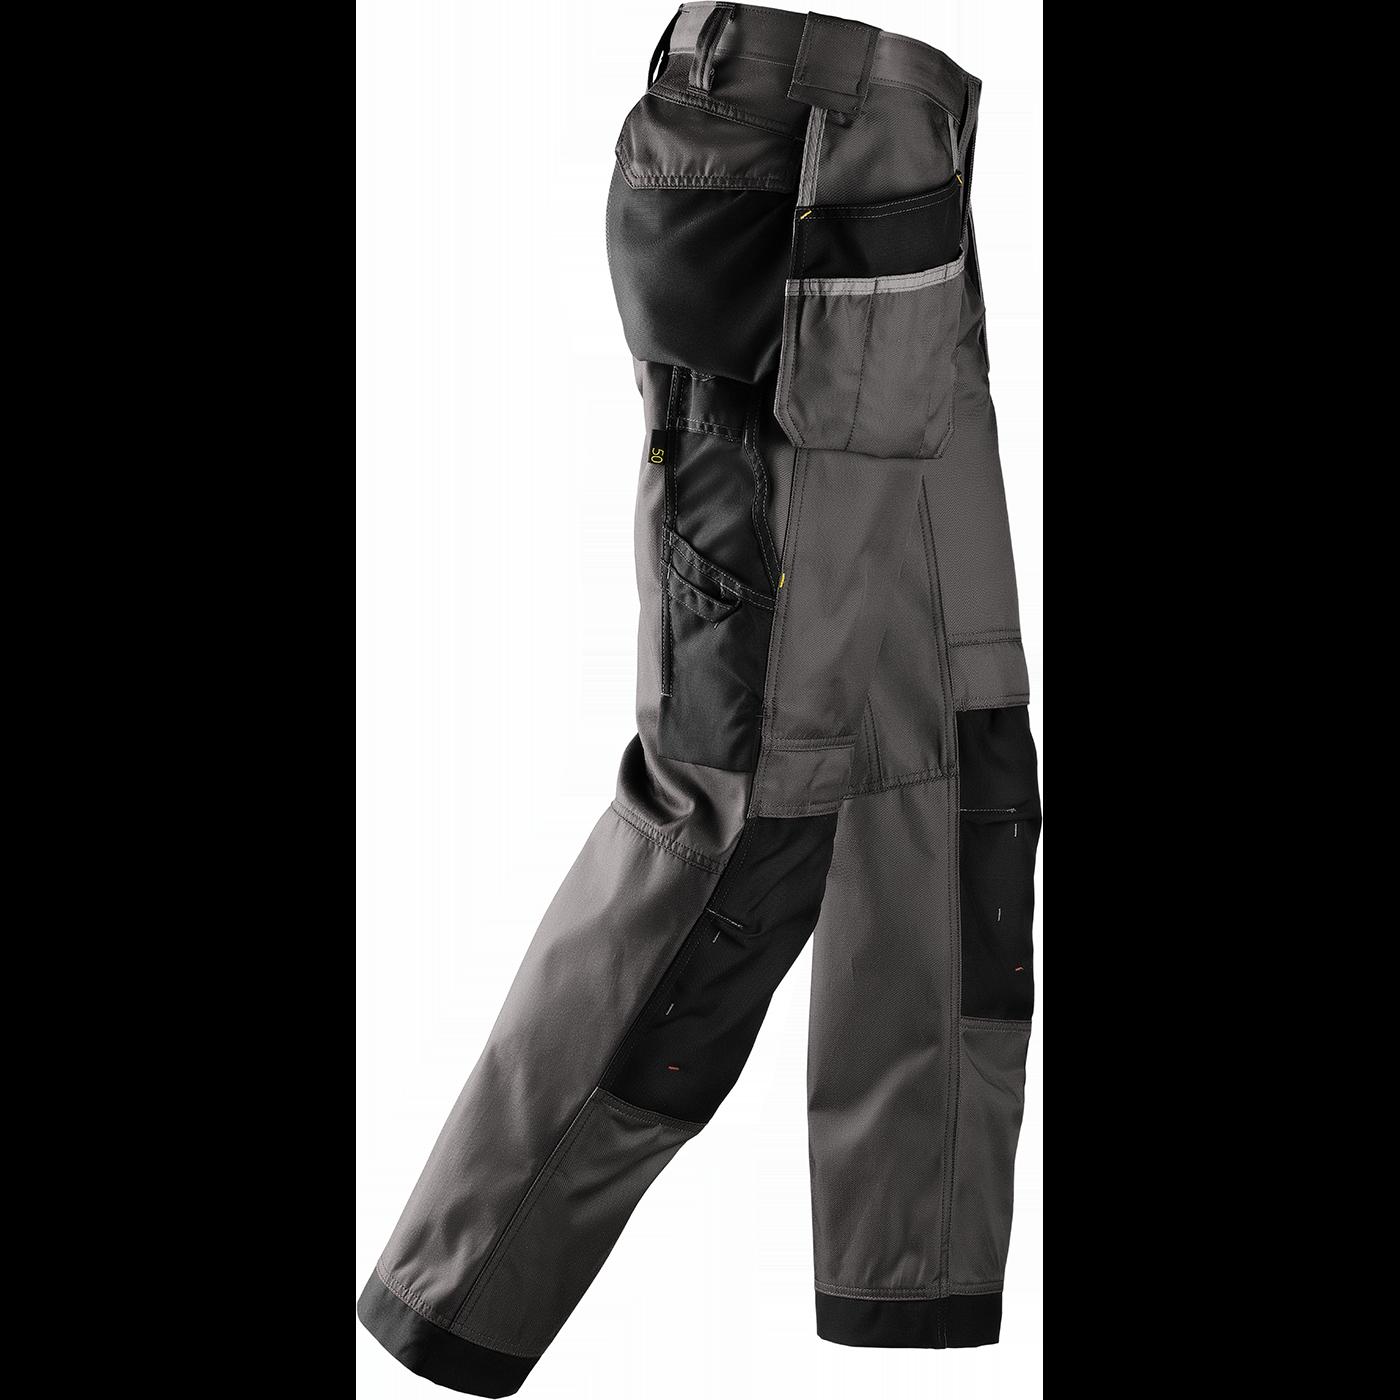 SNICKERS Workwear D3O® Lite põlvekaitsmed